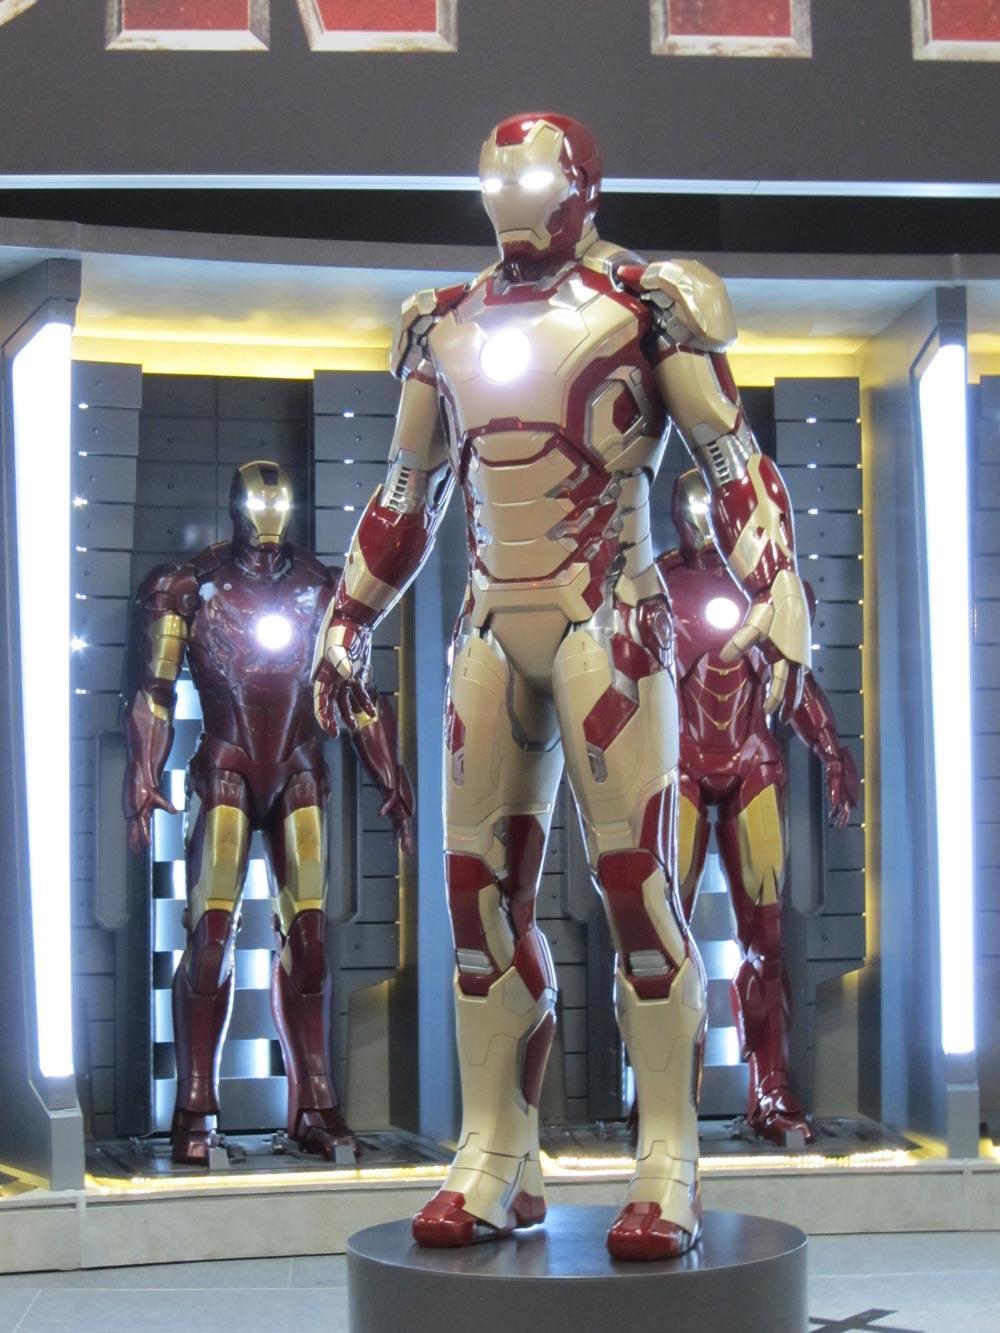 iron man 2 in hindi online free download full movie